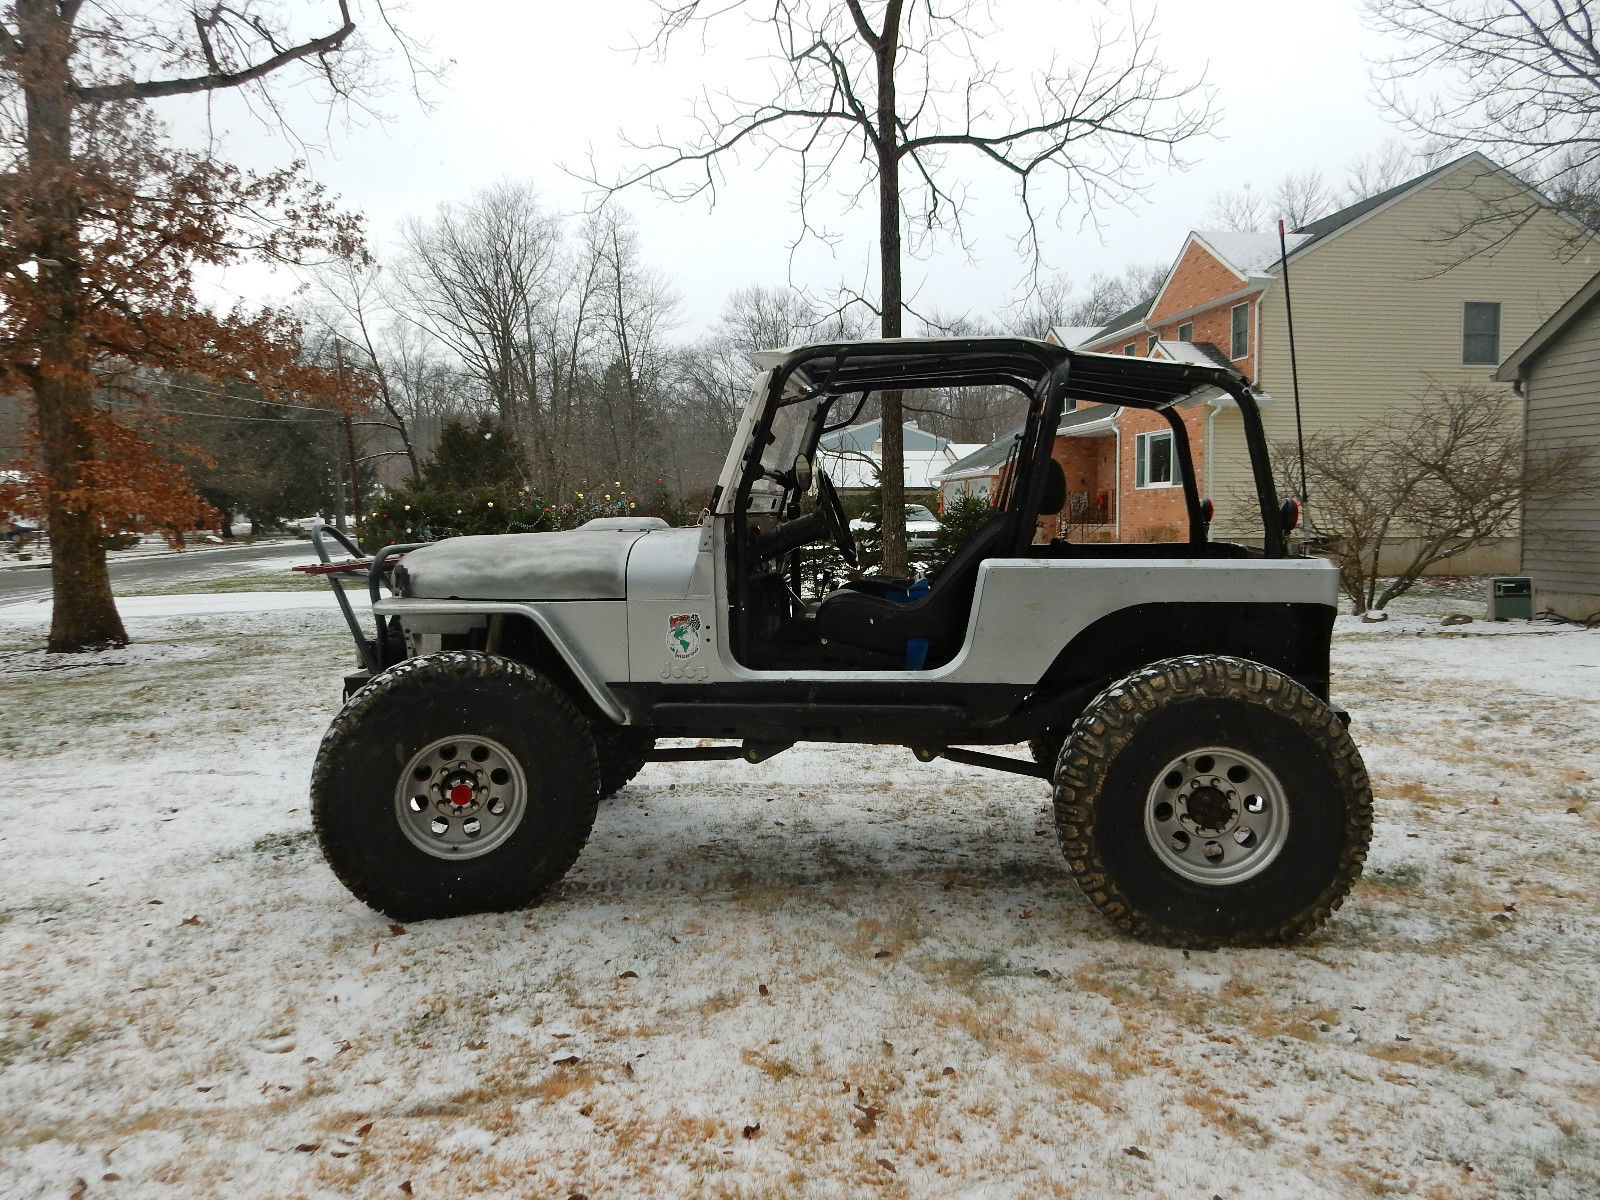 1979 Jeep Cj7 Rock Crawler Buggy Cj 7 4 0 Fuel Injected 1